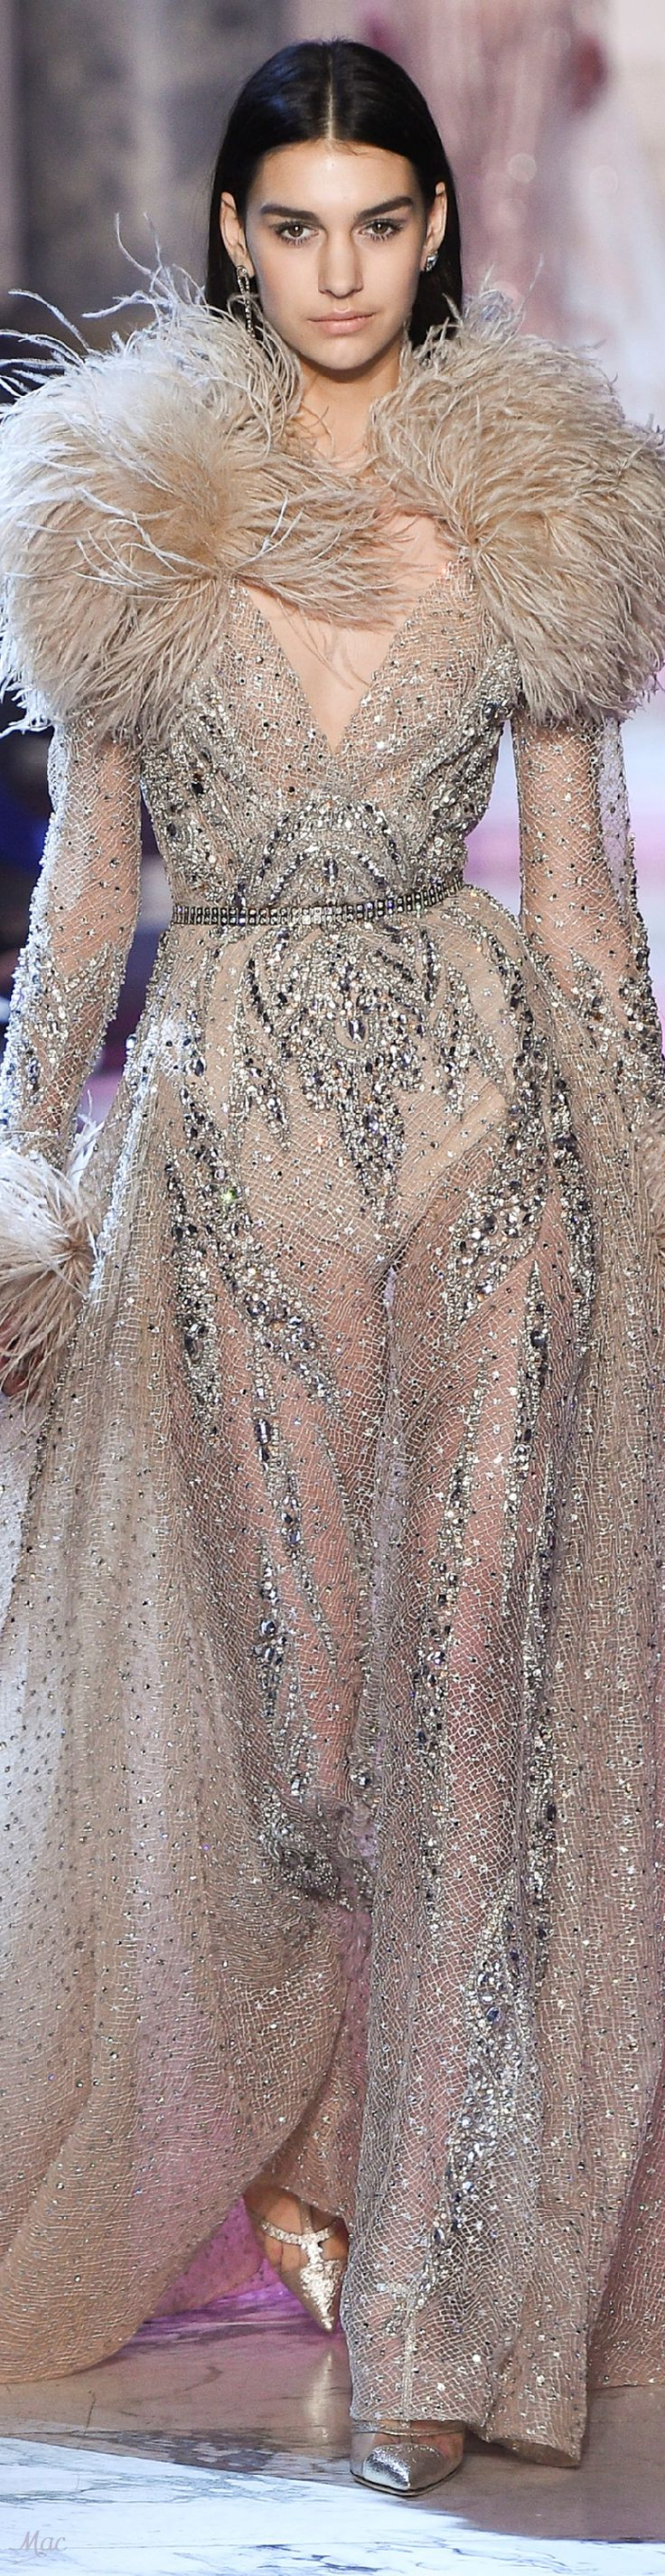 Spring 2018 Haute Couture Elie Saab